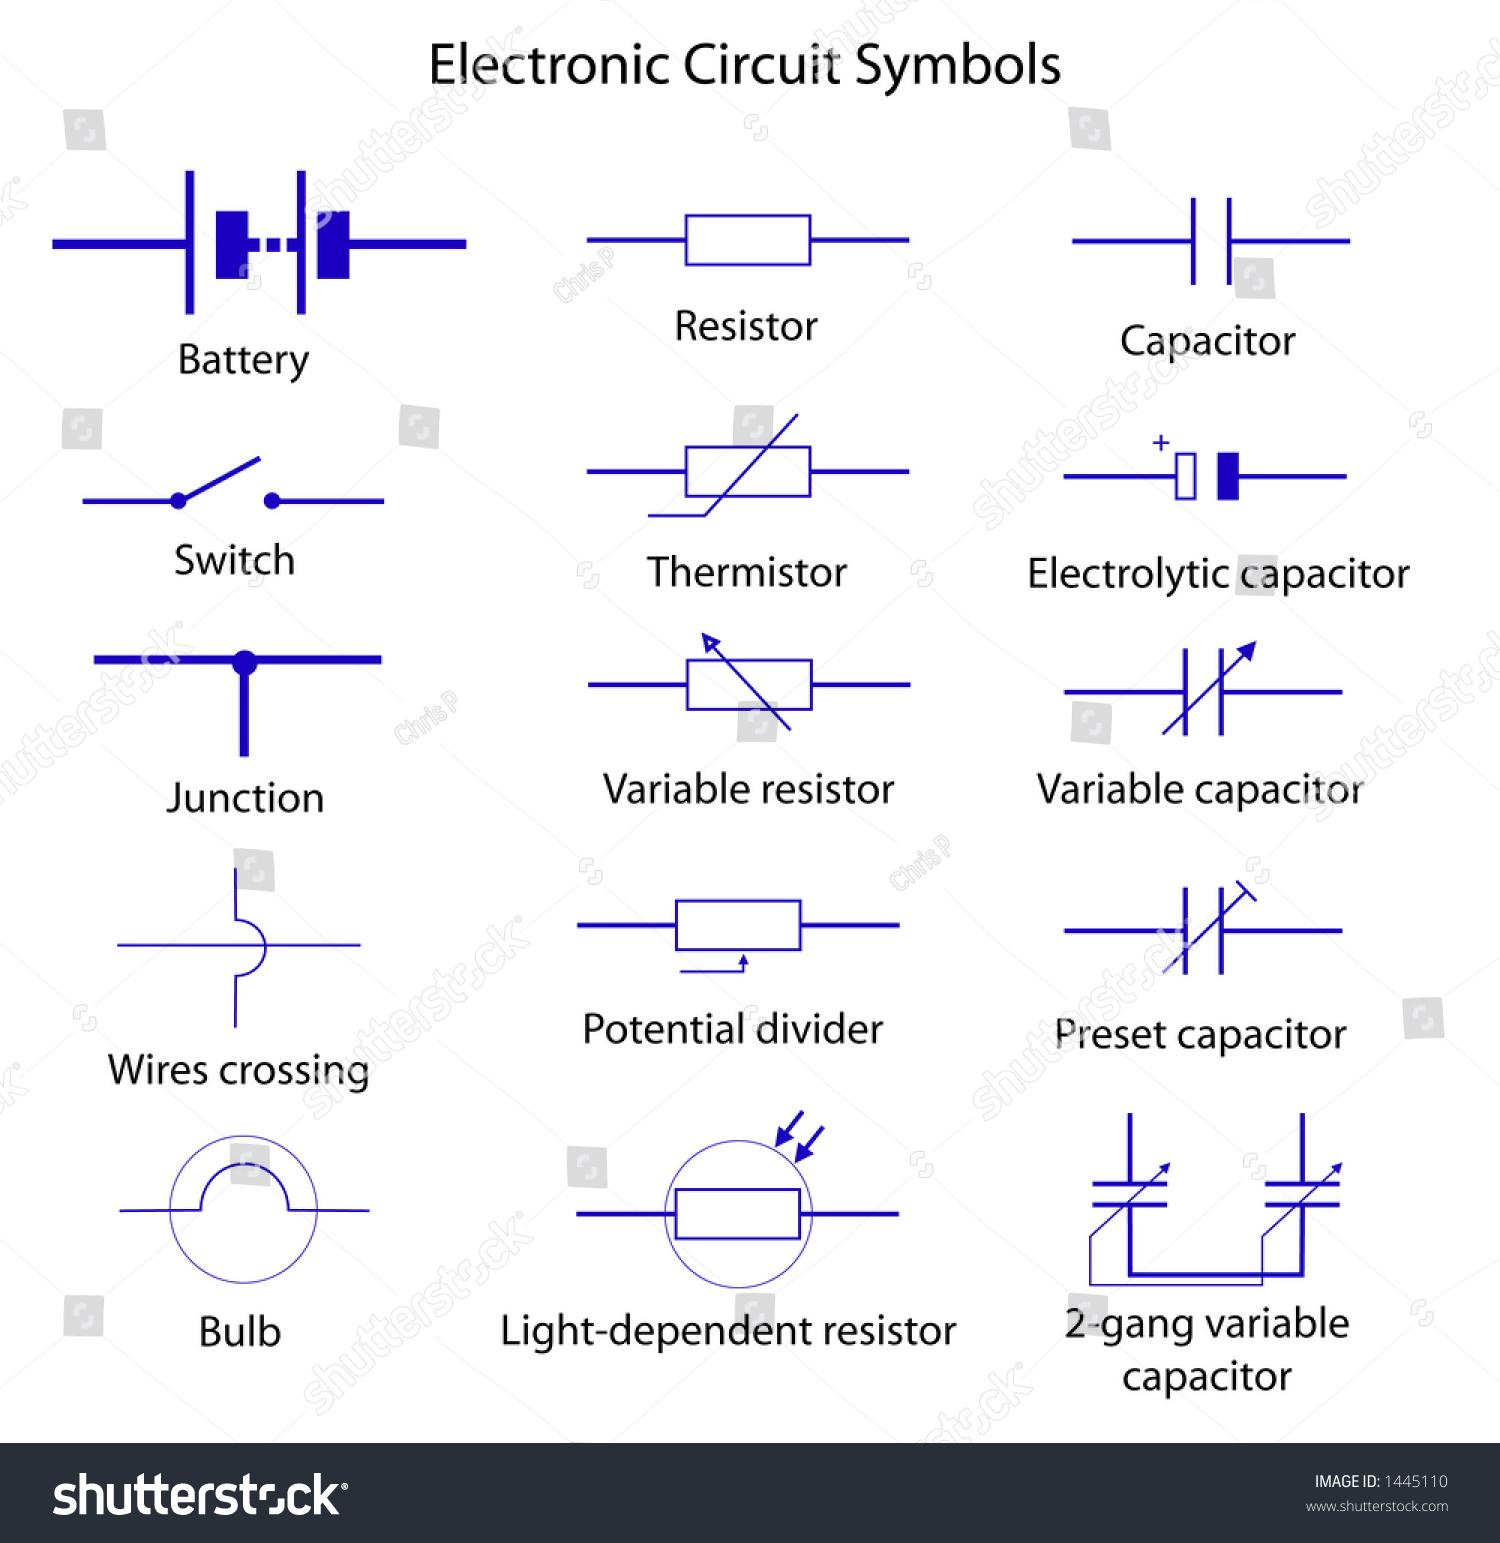 Electronic Circuit Symbols Stock Vector